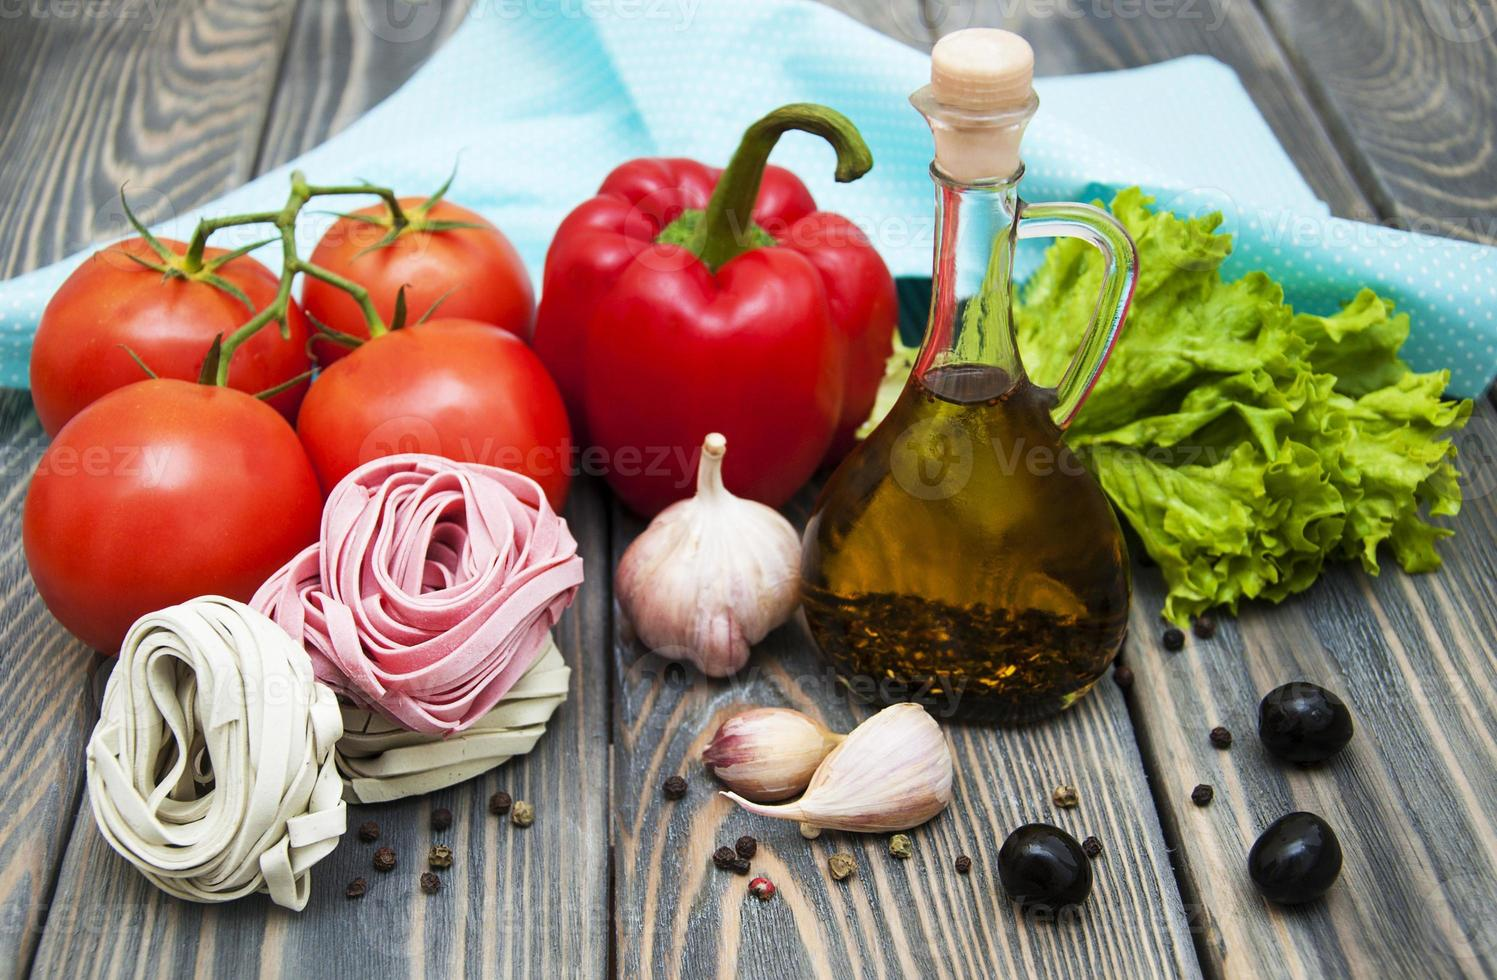 ingredienti per la pasta italiana foto